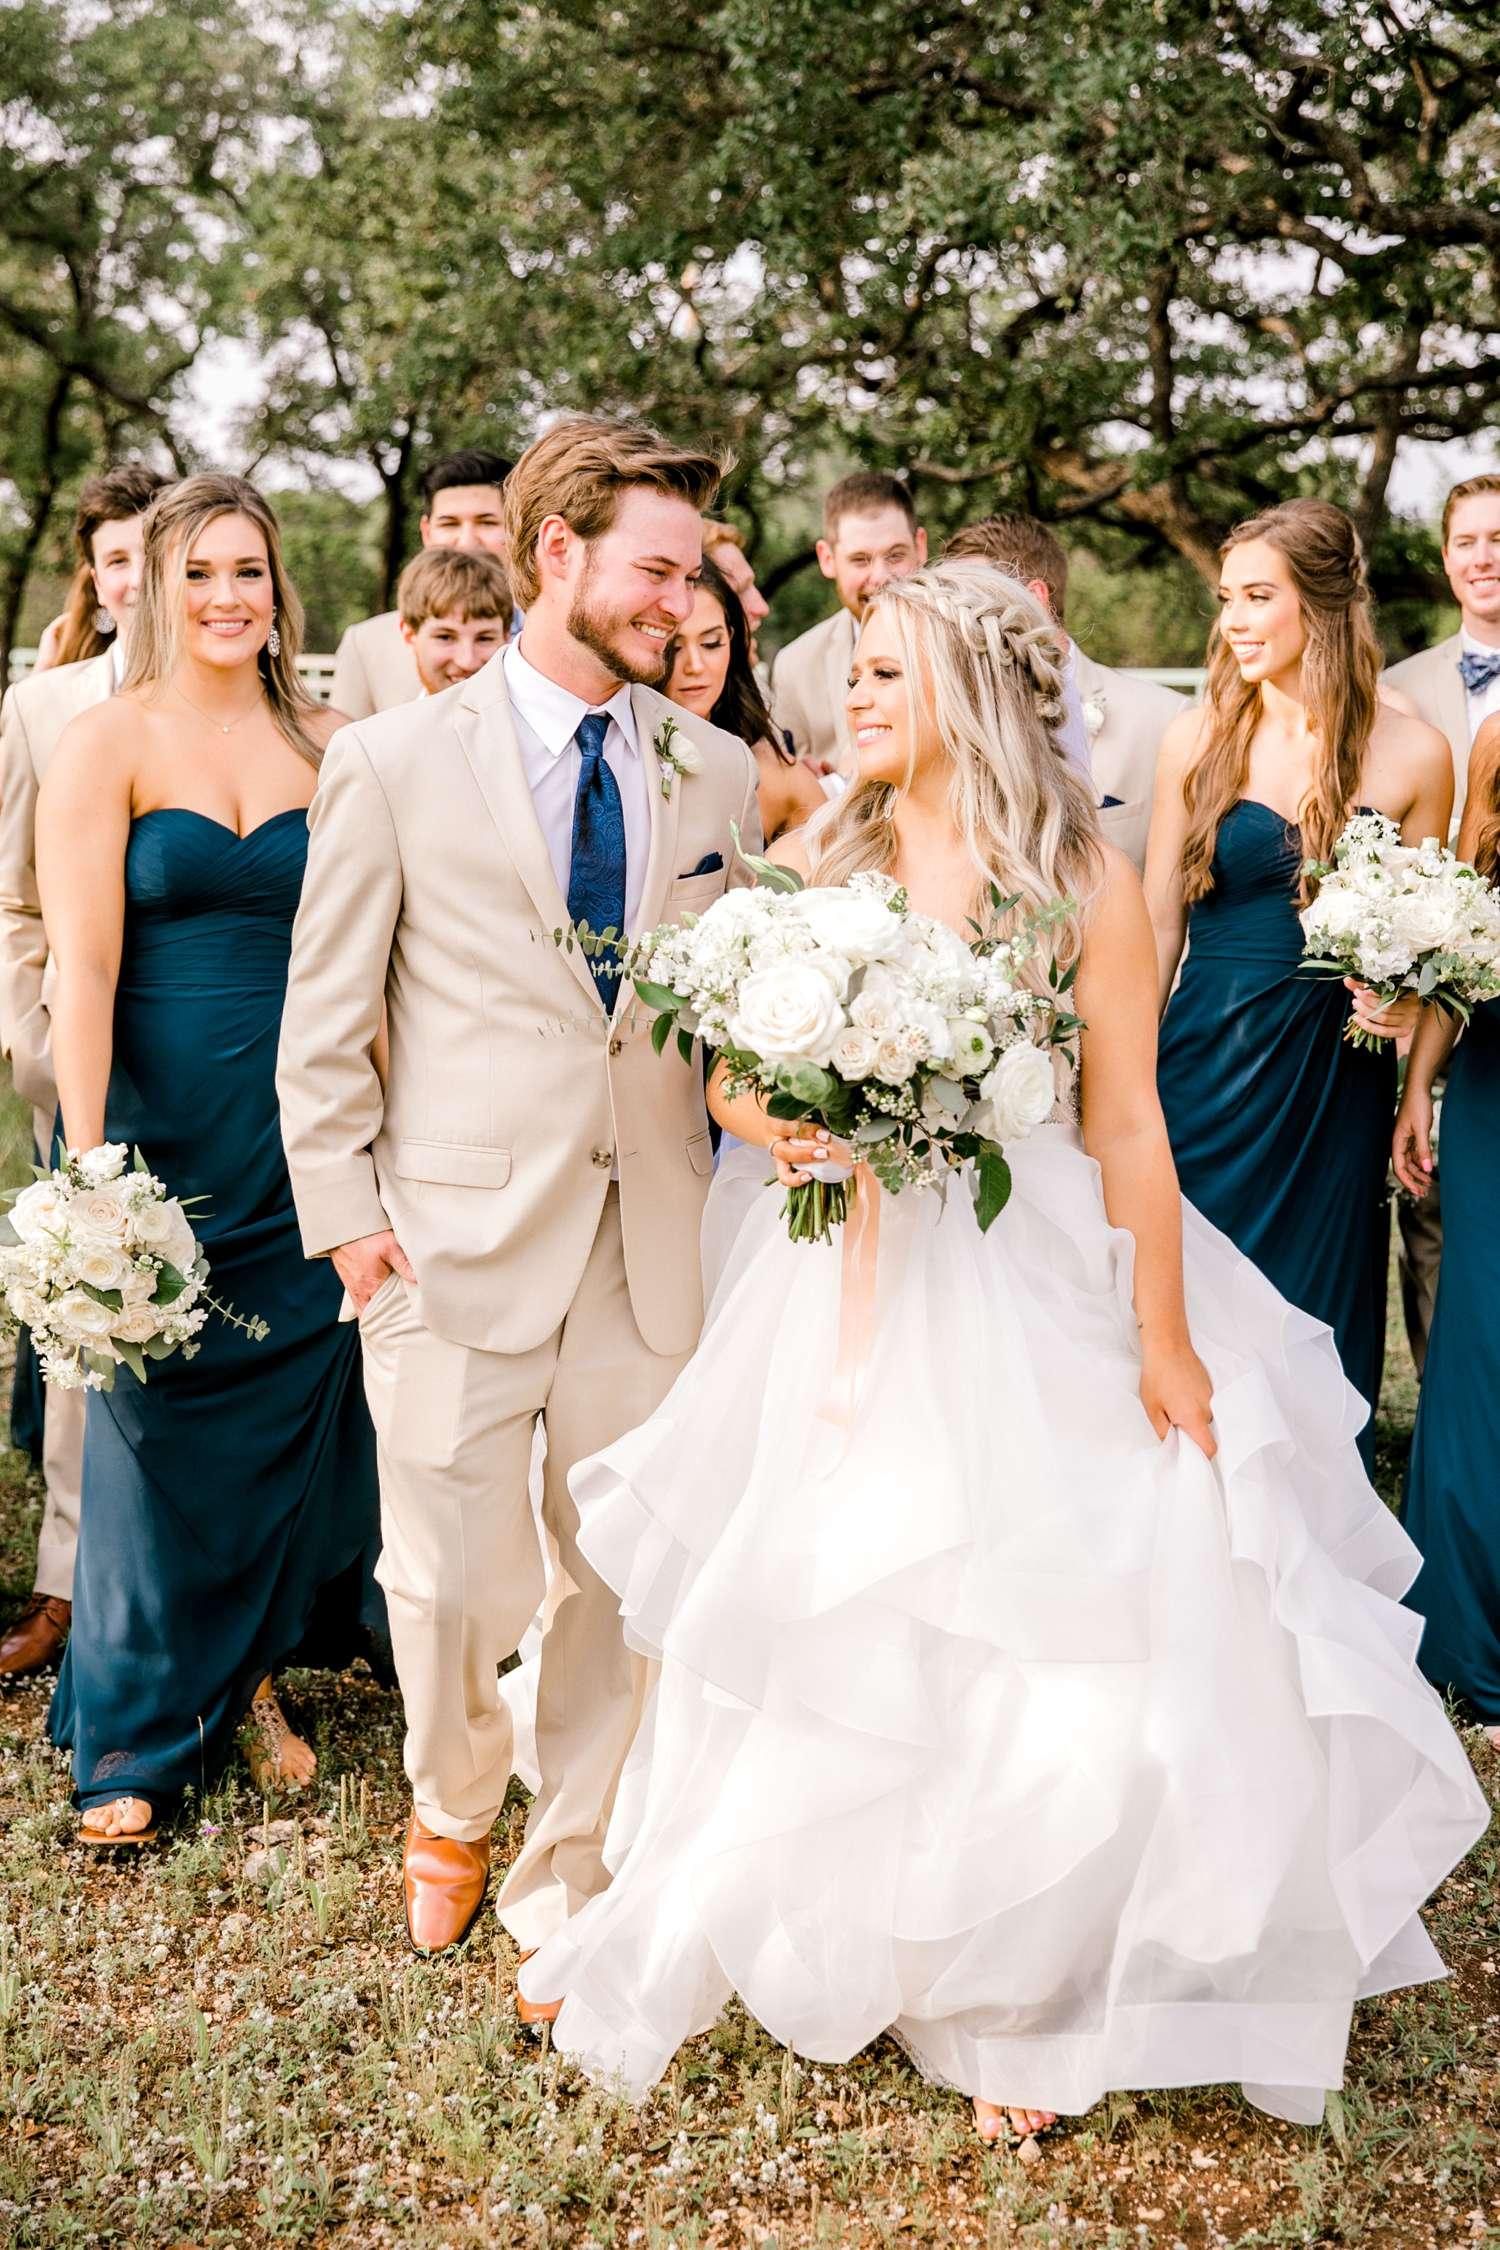 HAYLEE+JUSTIN+GREGORY+HERITAGE_HAUS_AUSTIN_TEXAS_WEDDING_0098.jpg